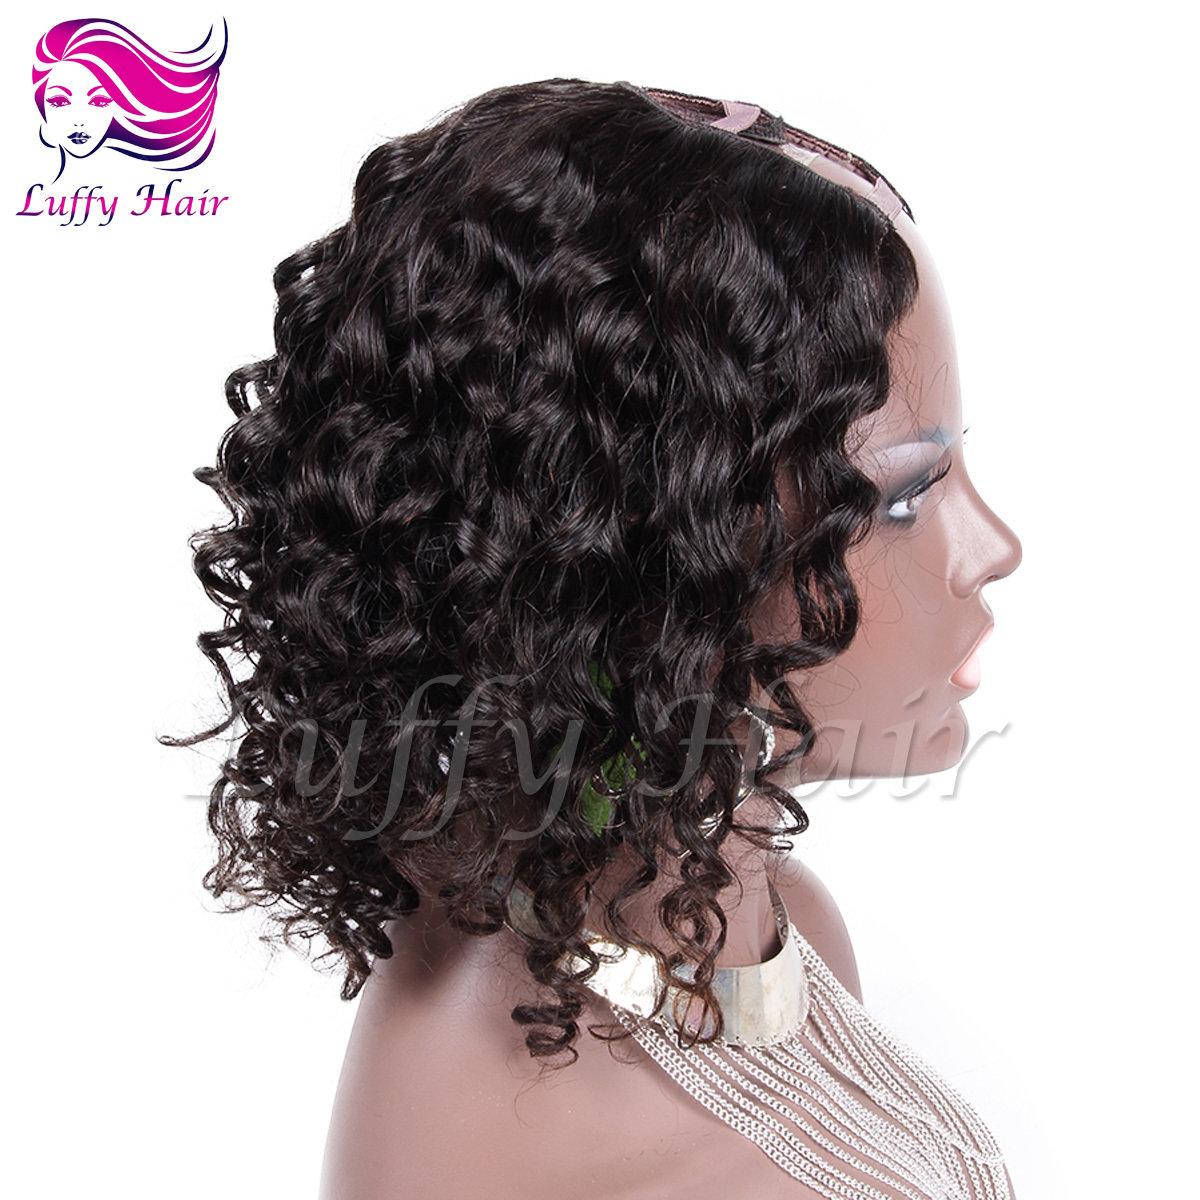 8A Virgin Human Hair Body Wave U Part Wig - KWU014